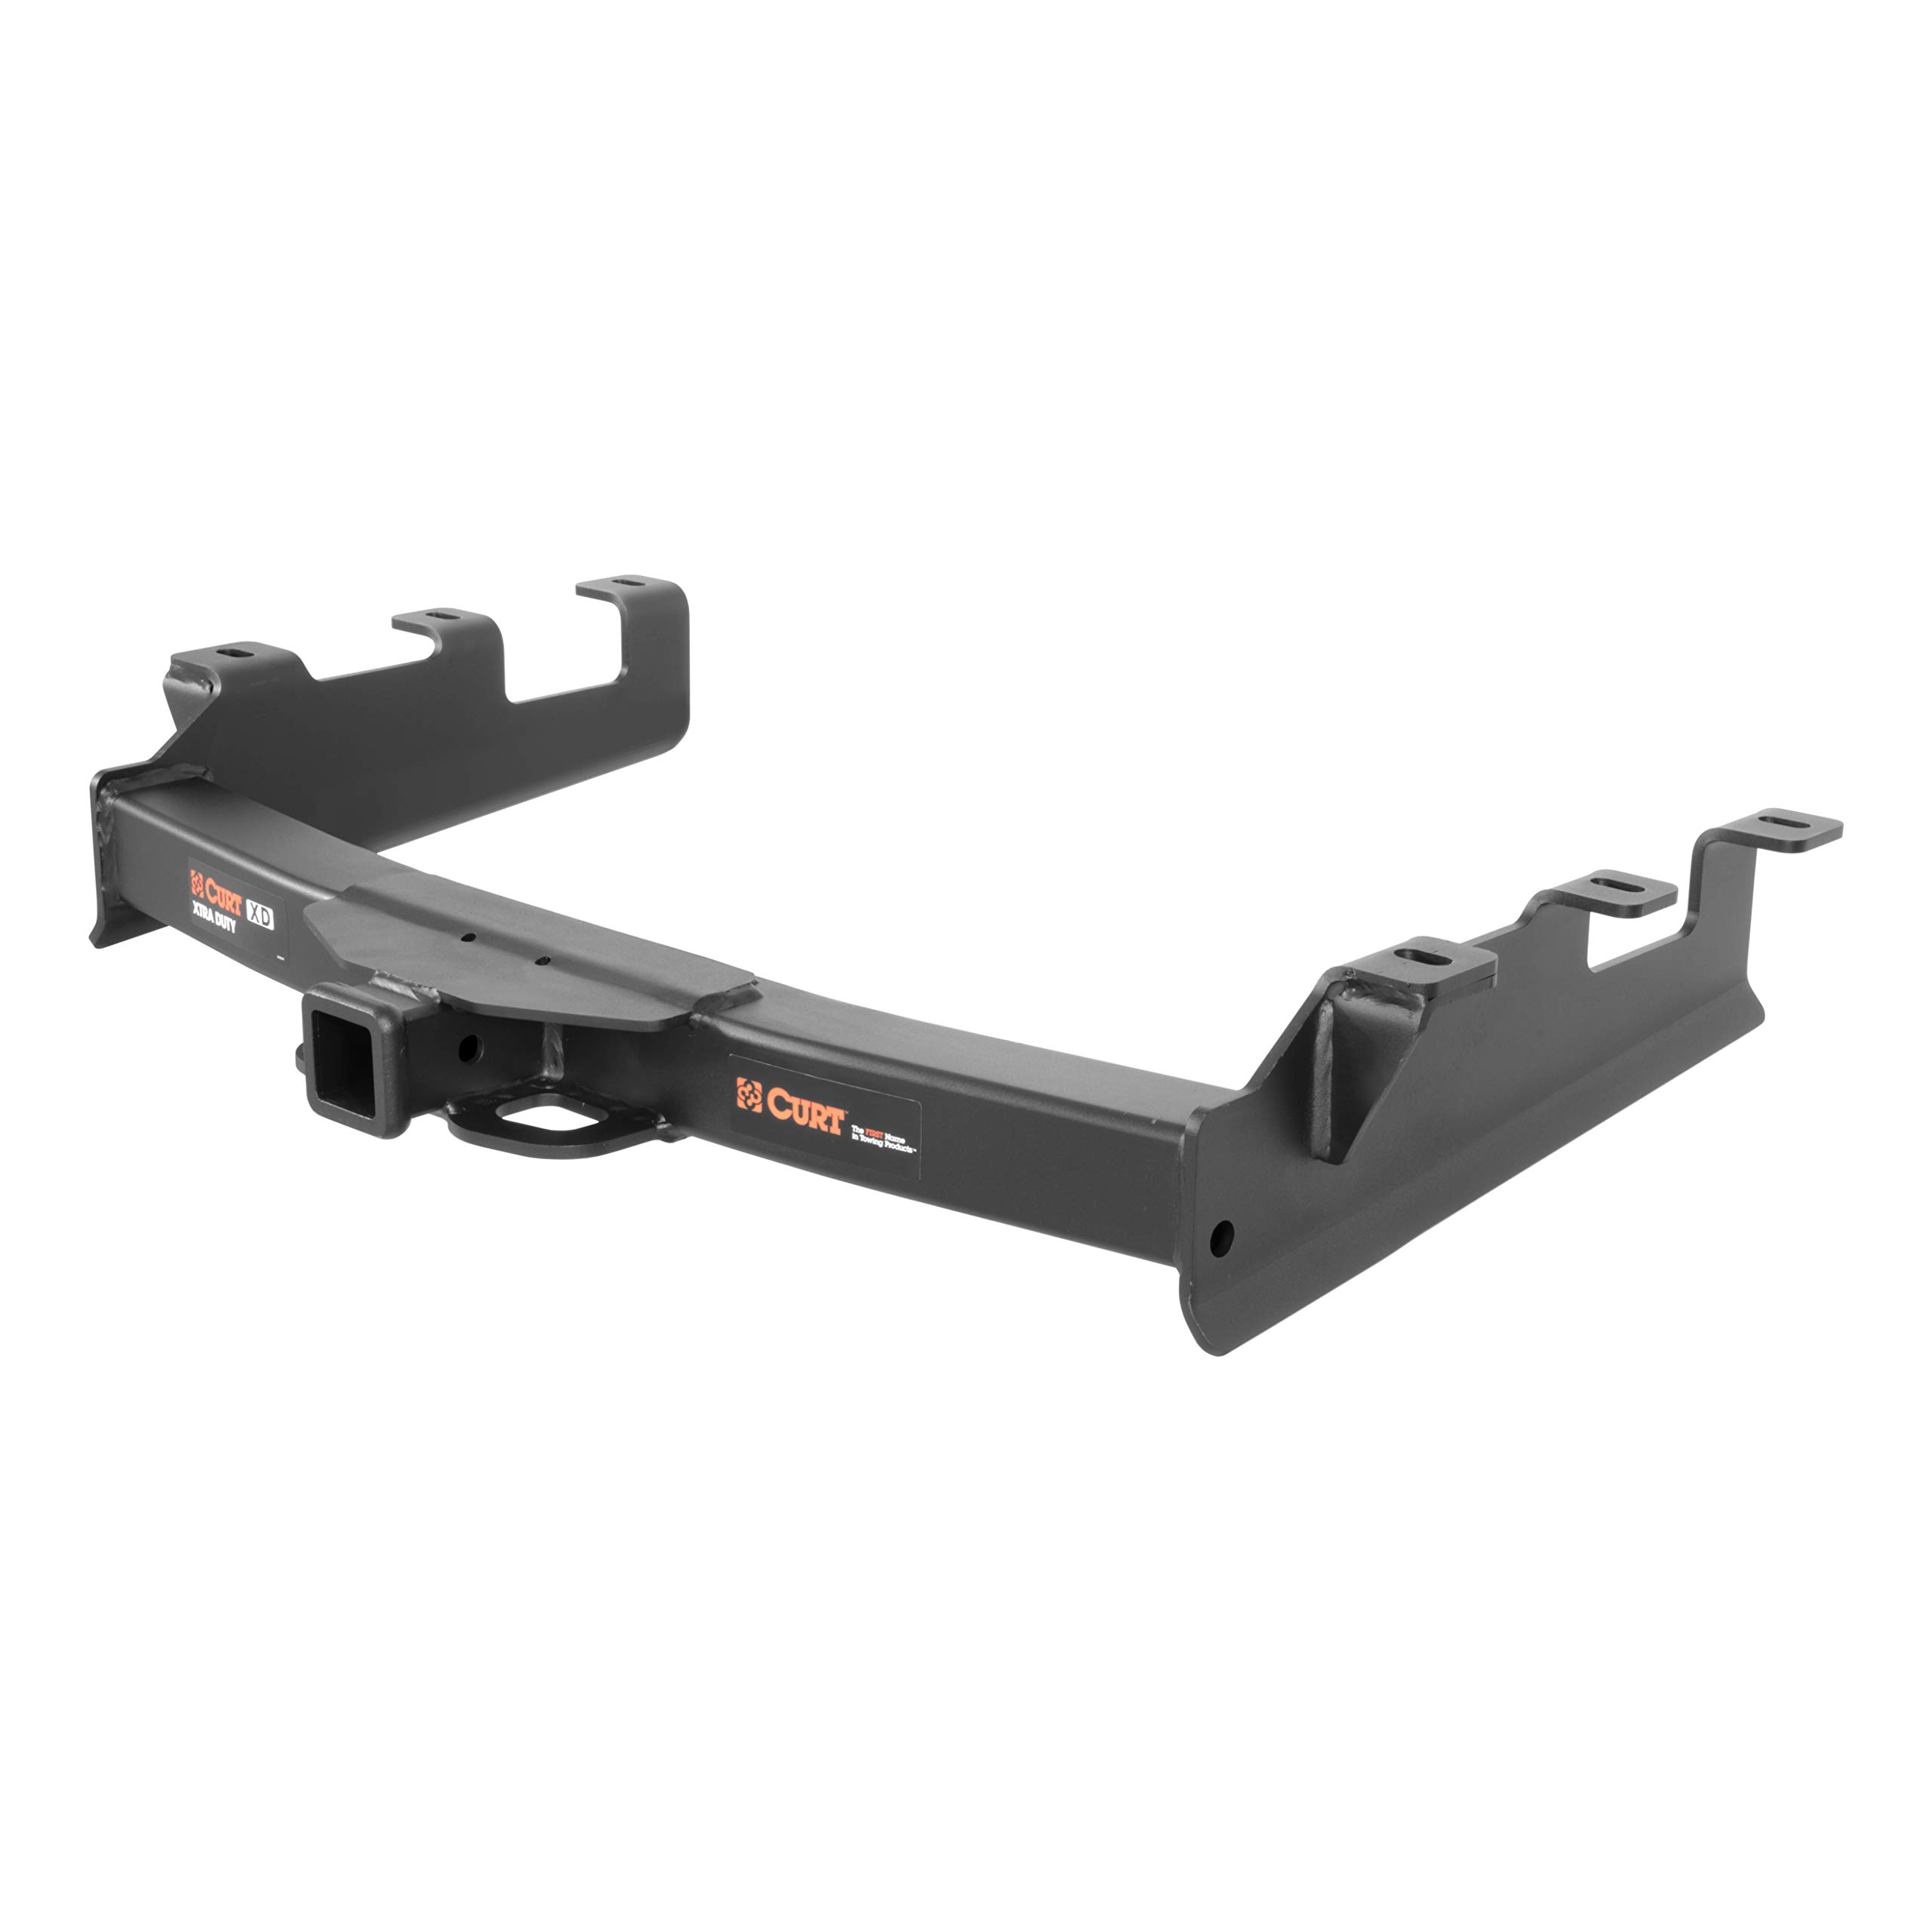 CURT 15302 Xtra Duty Trailer Hitch with 2-Inch Receiver, for Select Chevrolet Silverado, GMC Sierra 2500